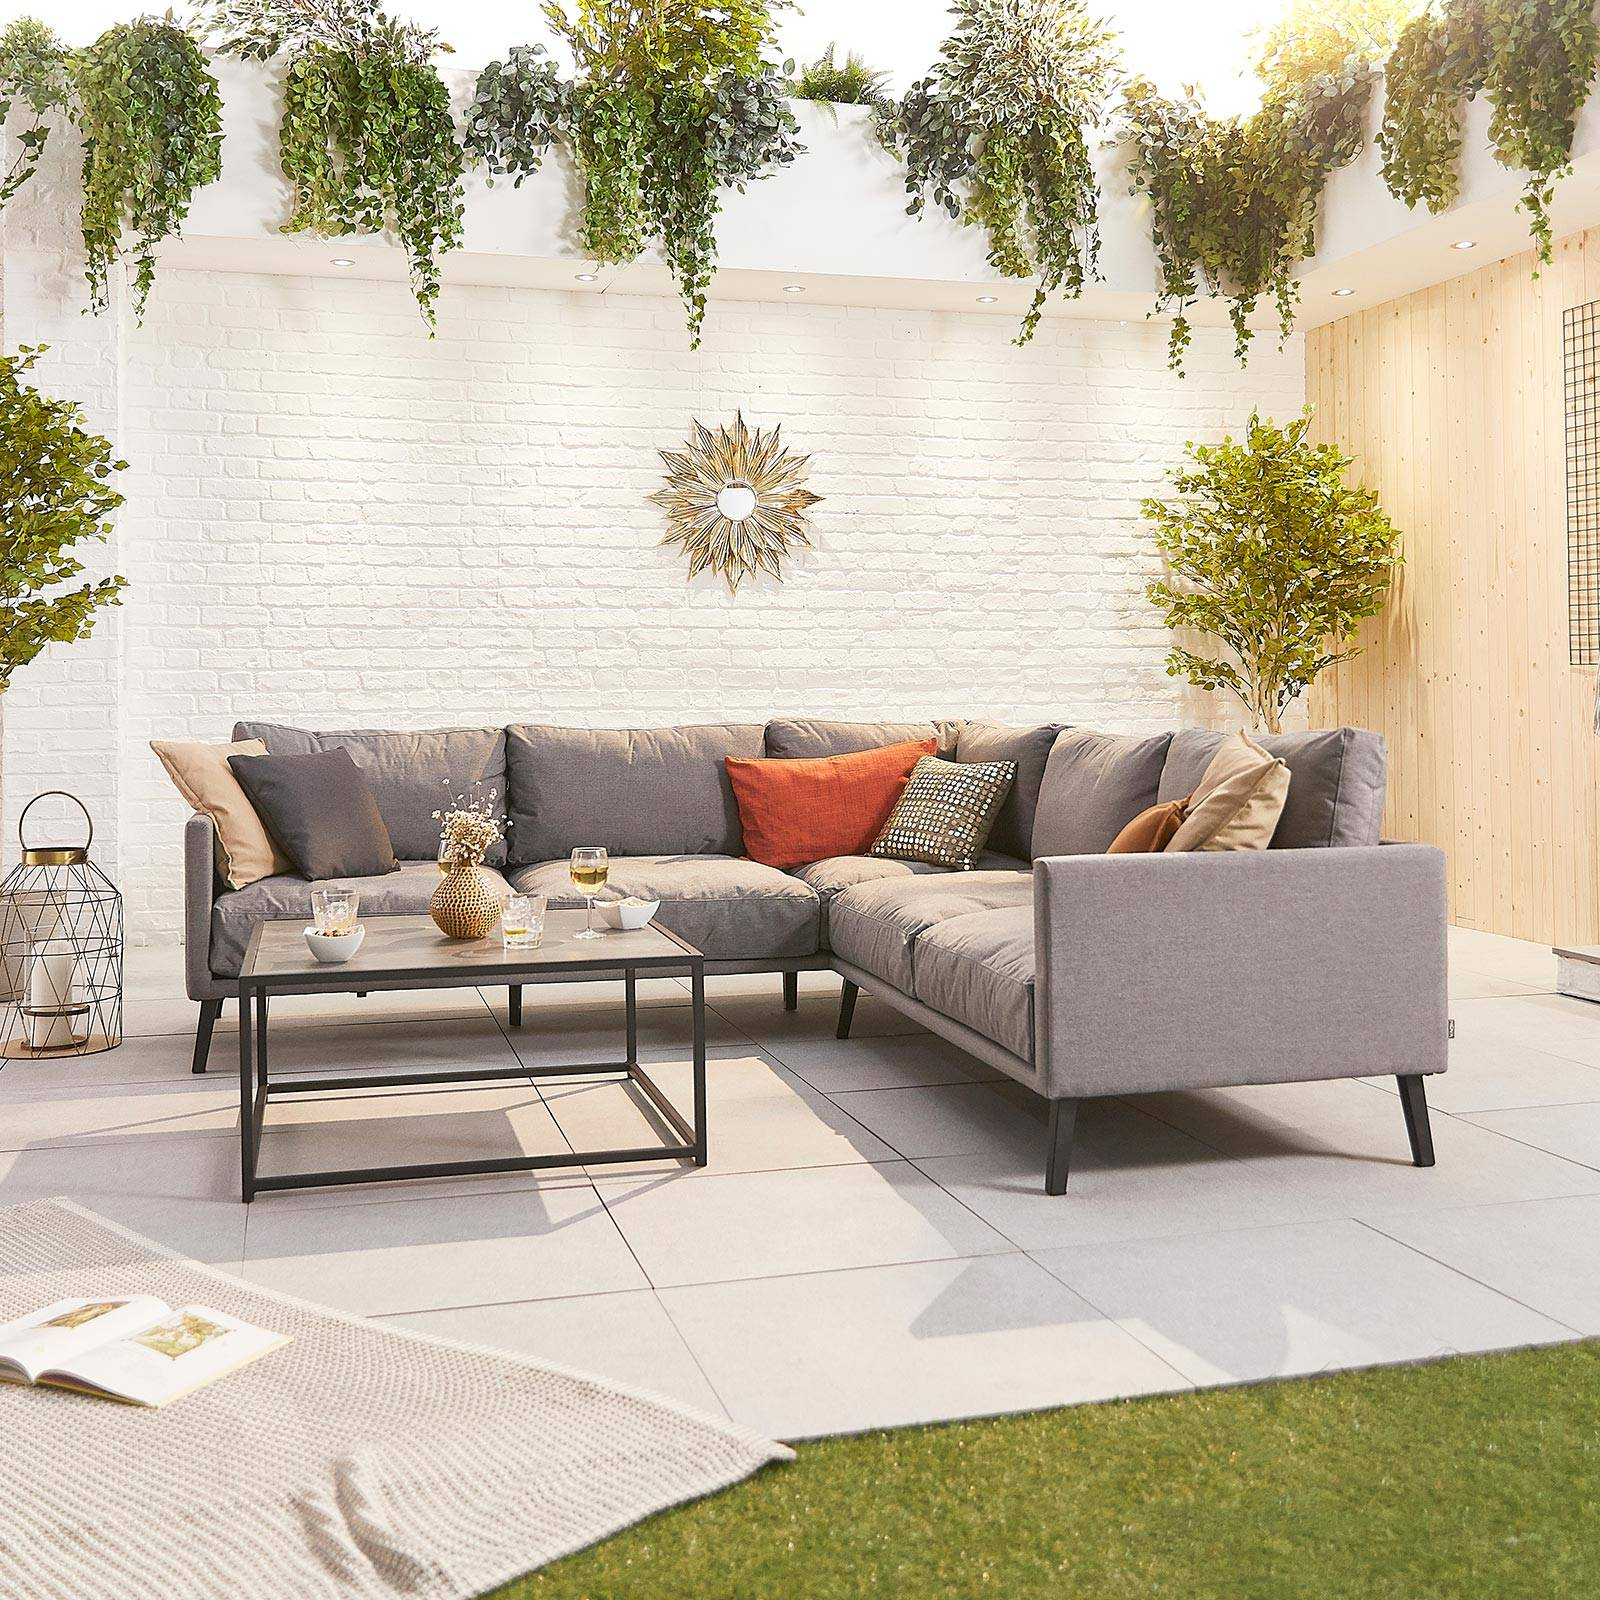 Oakworld Alfresco Bliss Outdoor Fabric Corner Sofa Set With Coffee Table